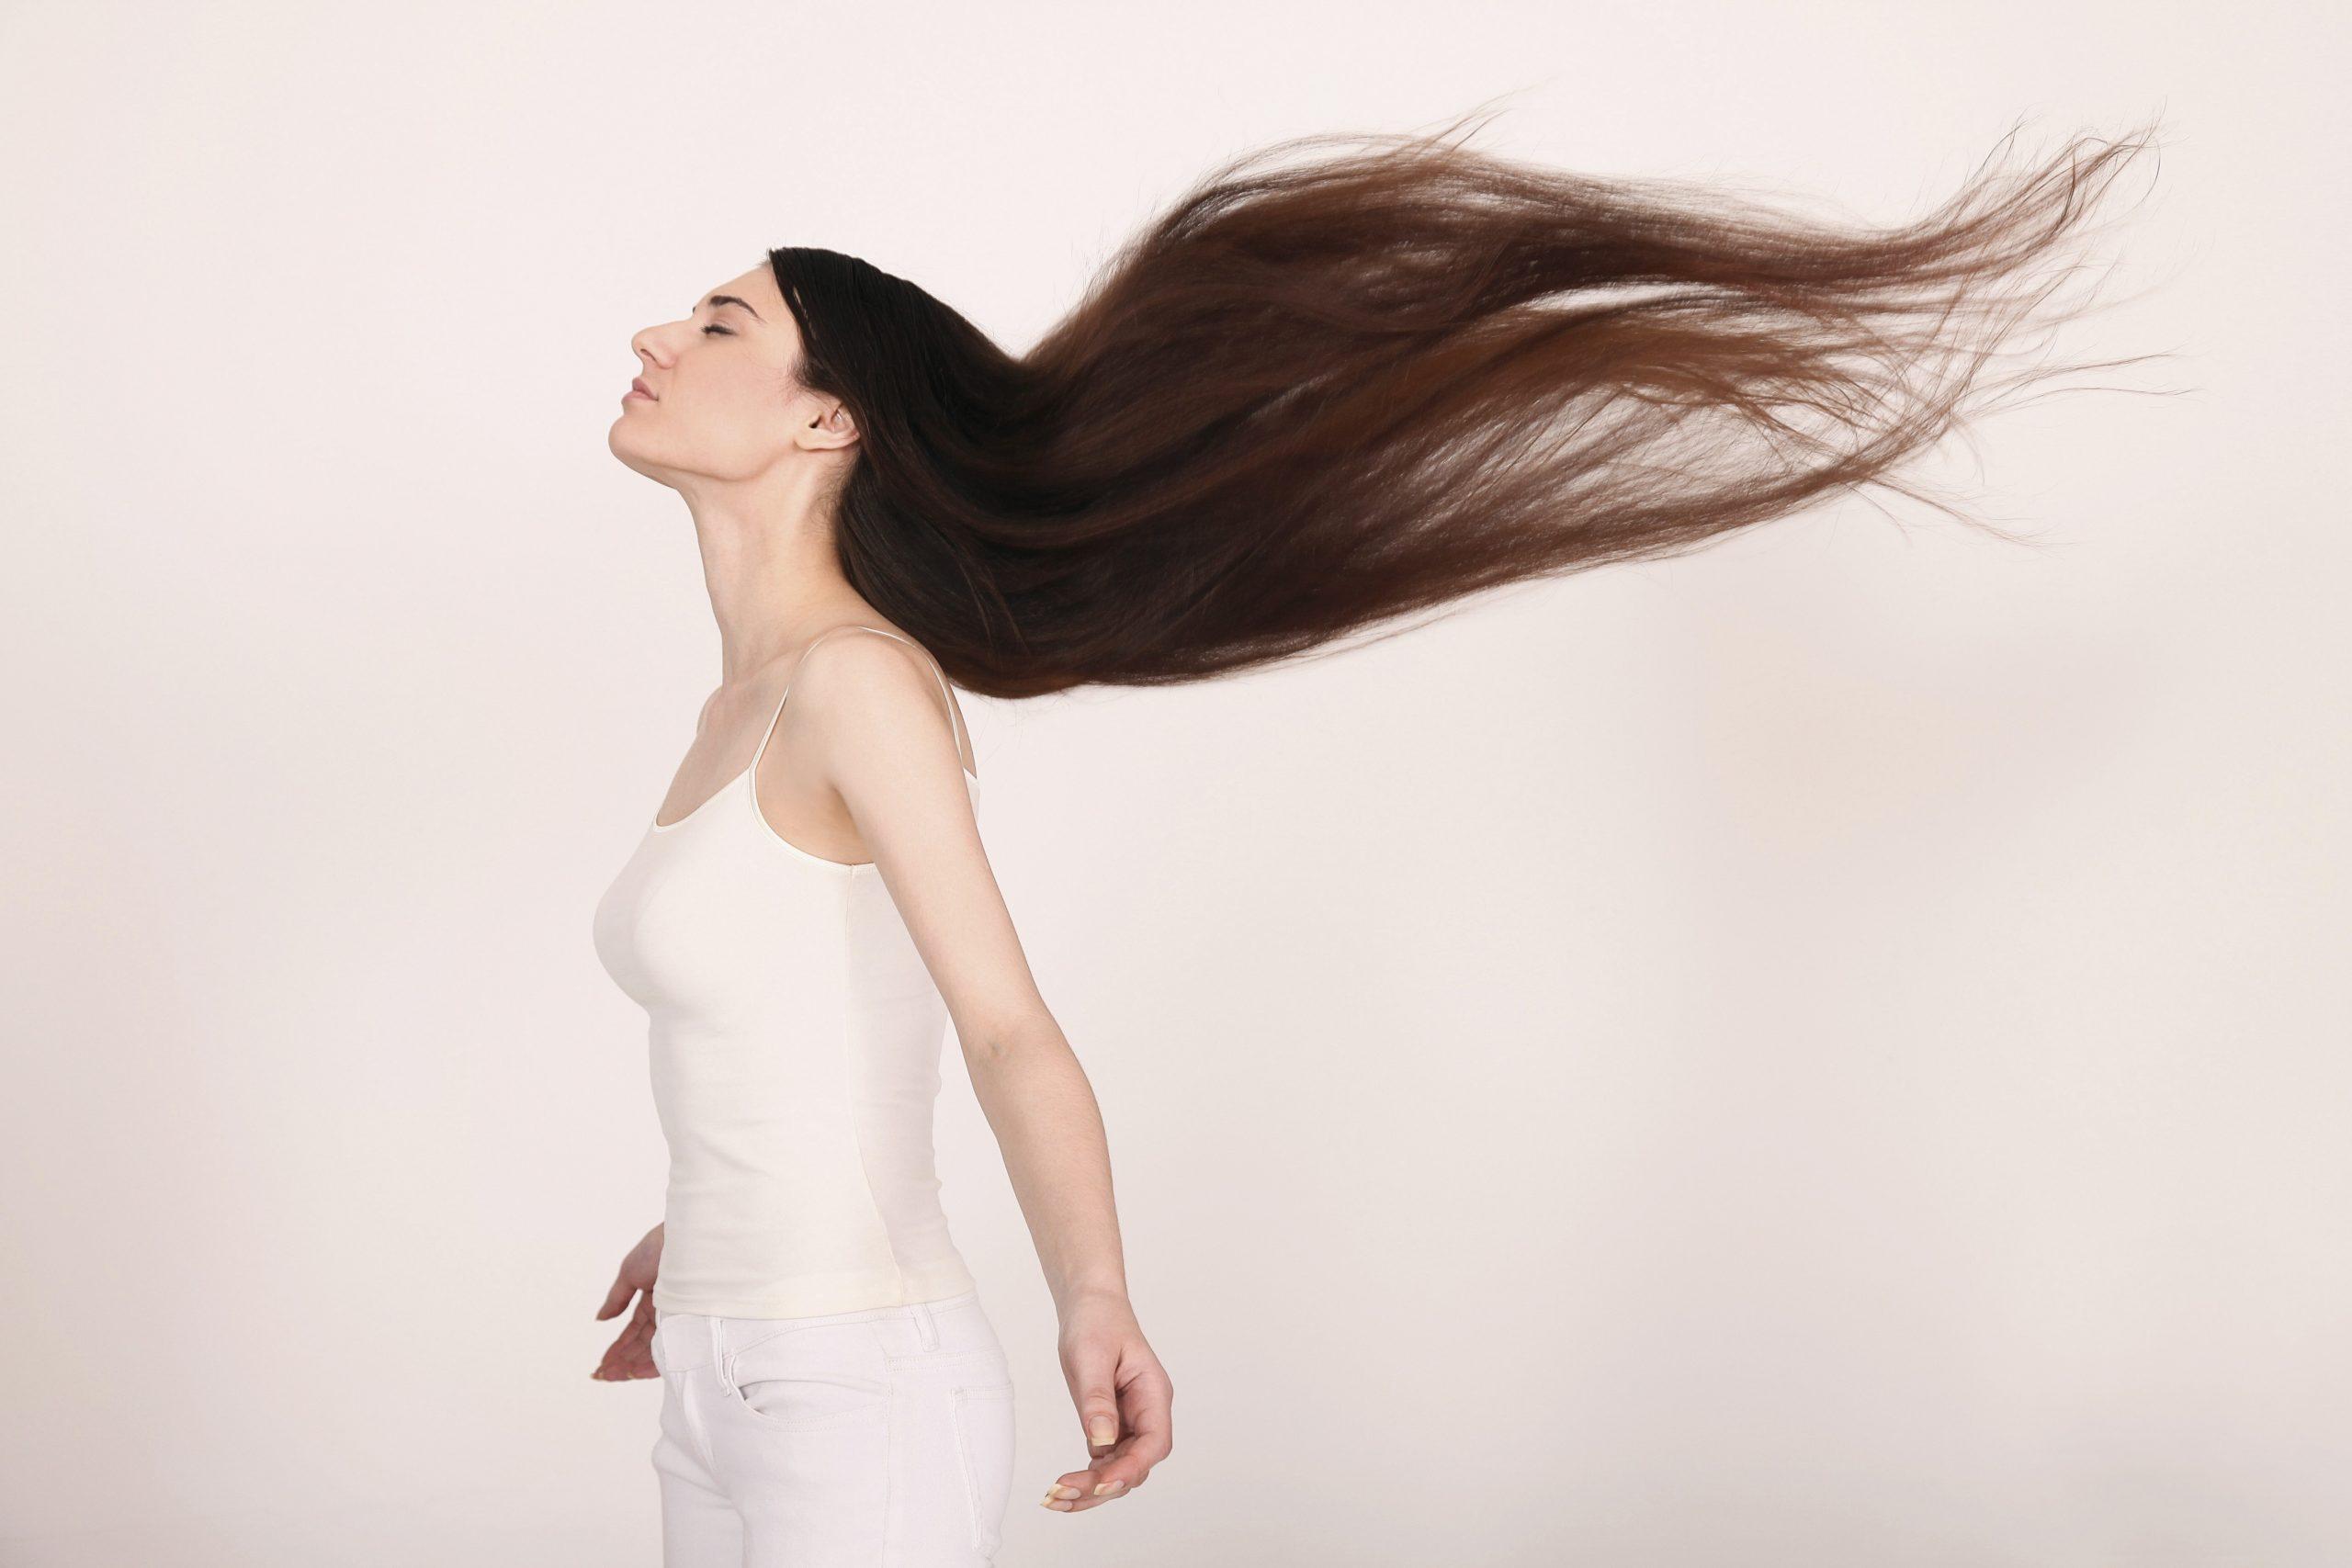 Healthy silky shiny hair